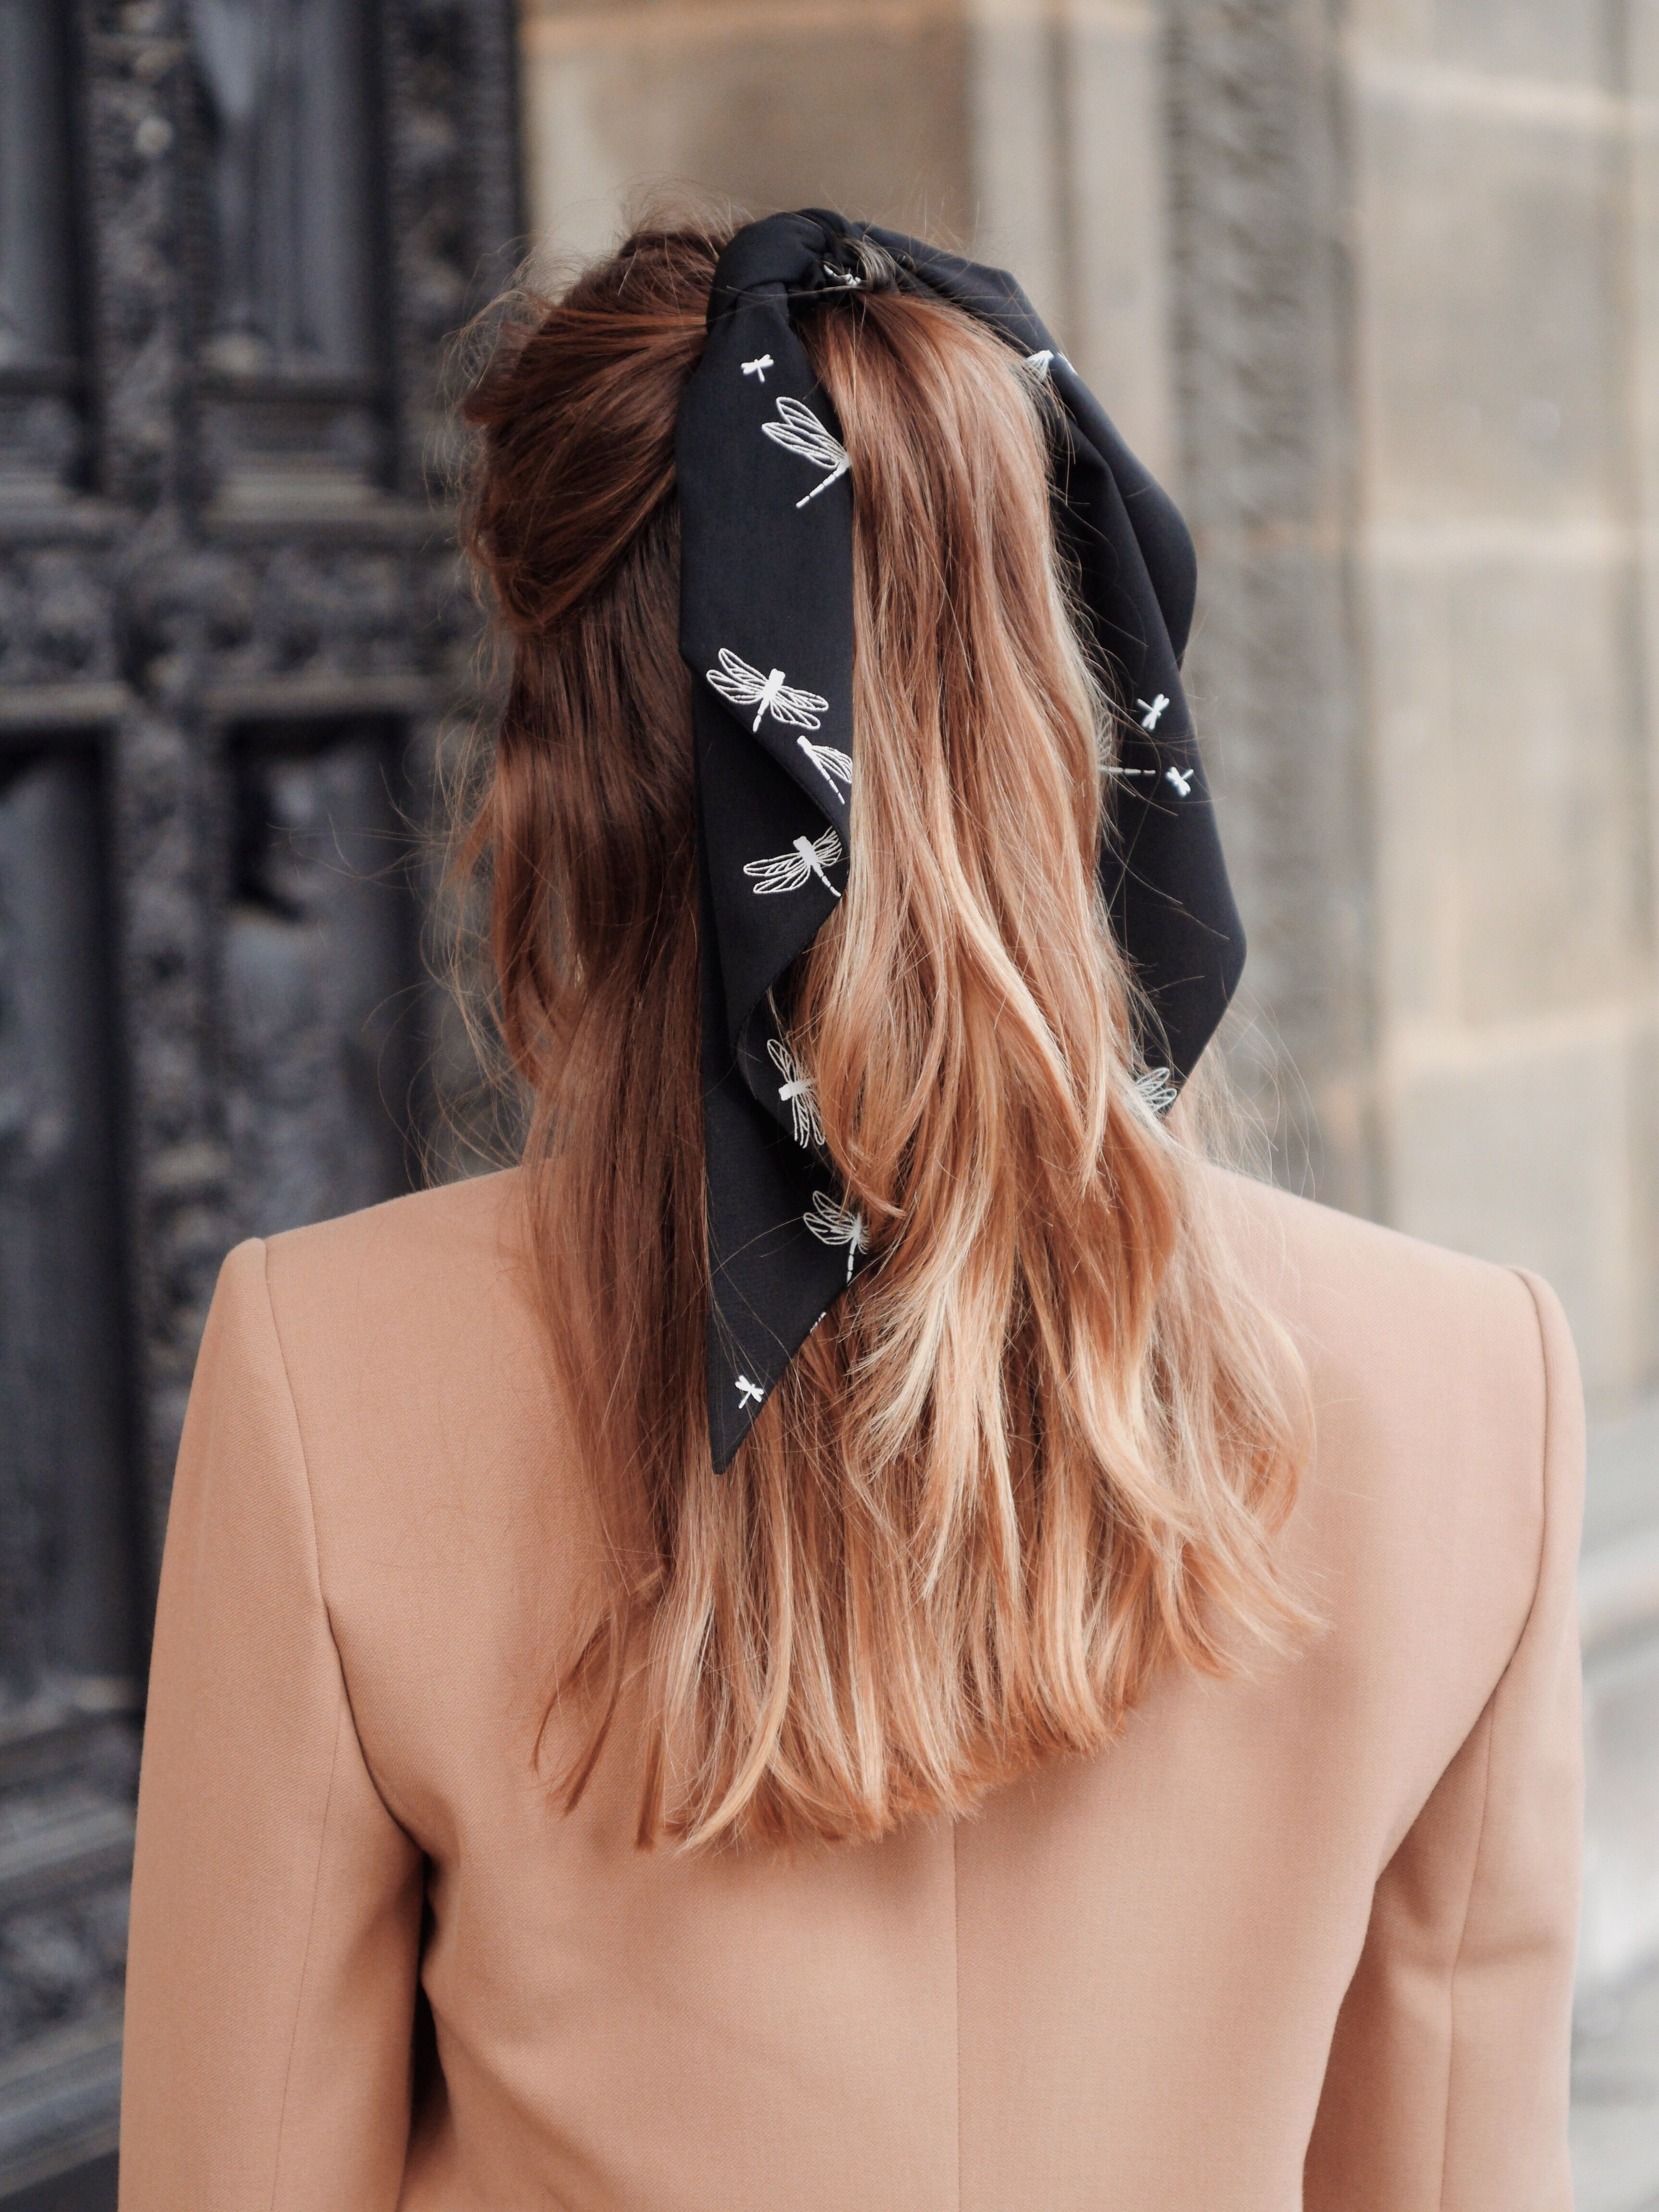 Foulchie Felicie Coiffure Avec Foulard Coiffure Cheveux Mi Long Coiffures Boho